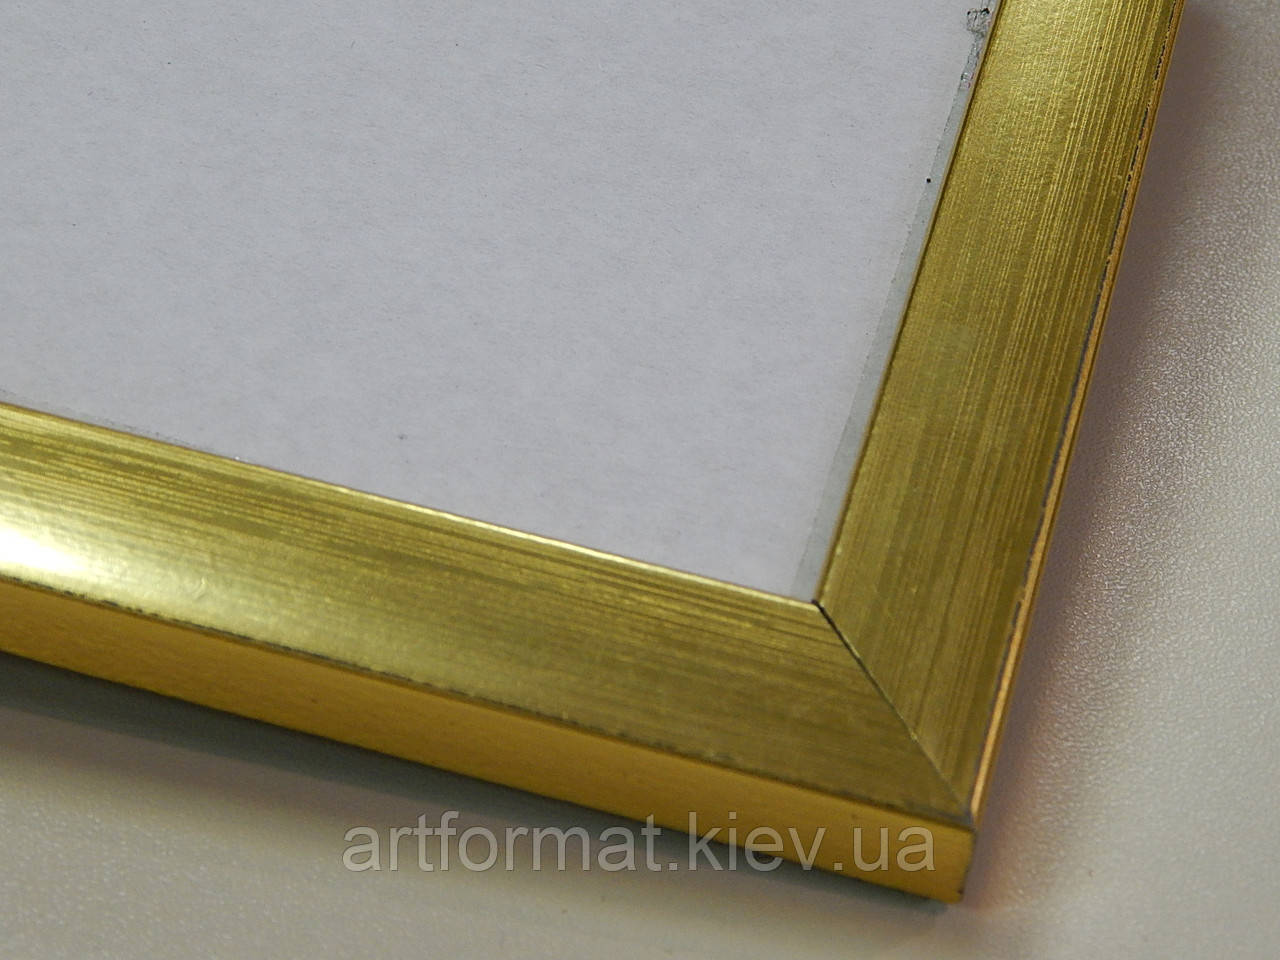 Рамка А3(297х420).Профиль 16 мм.Золото.